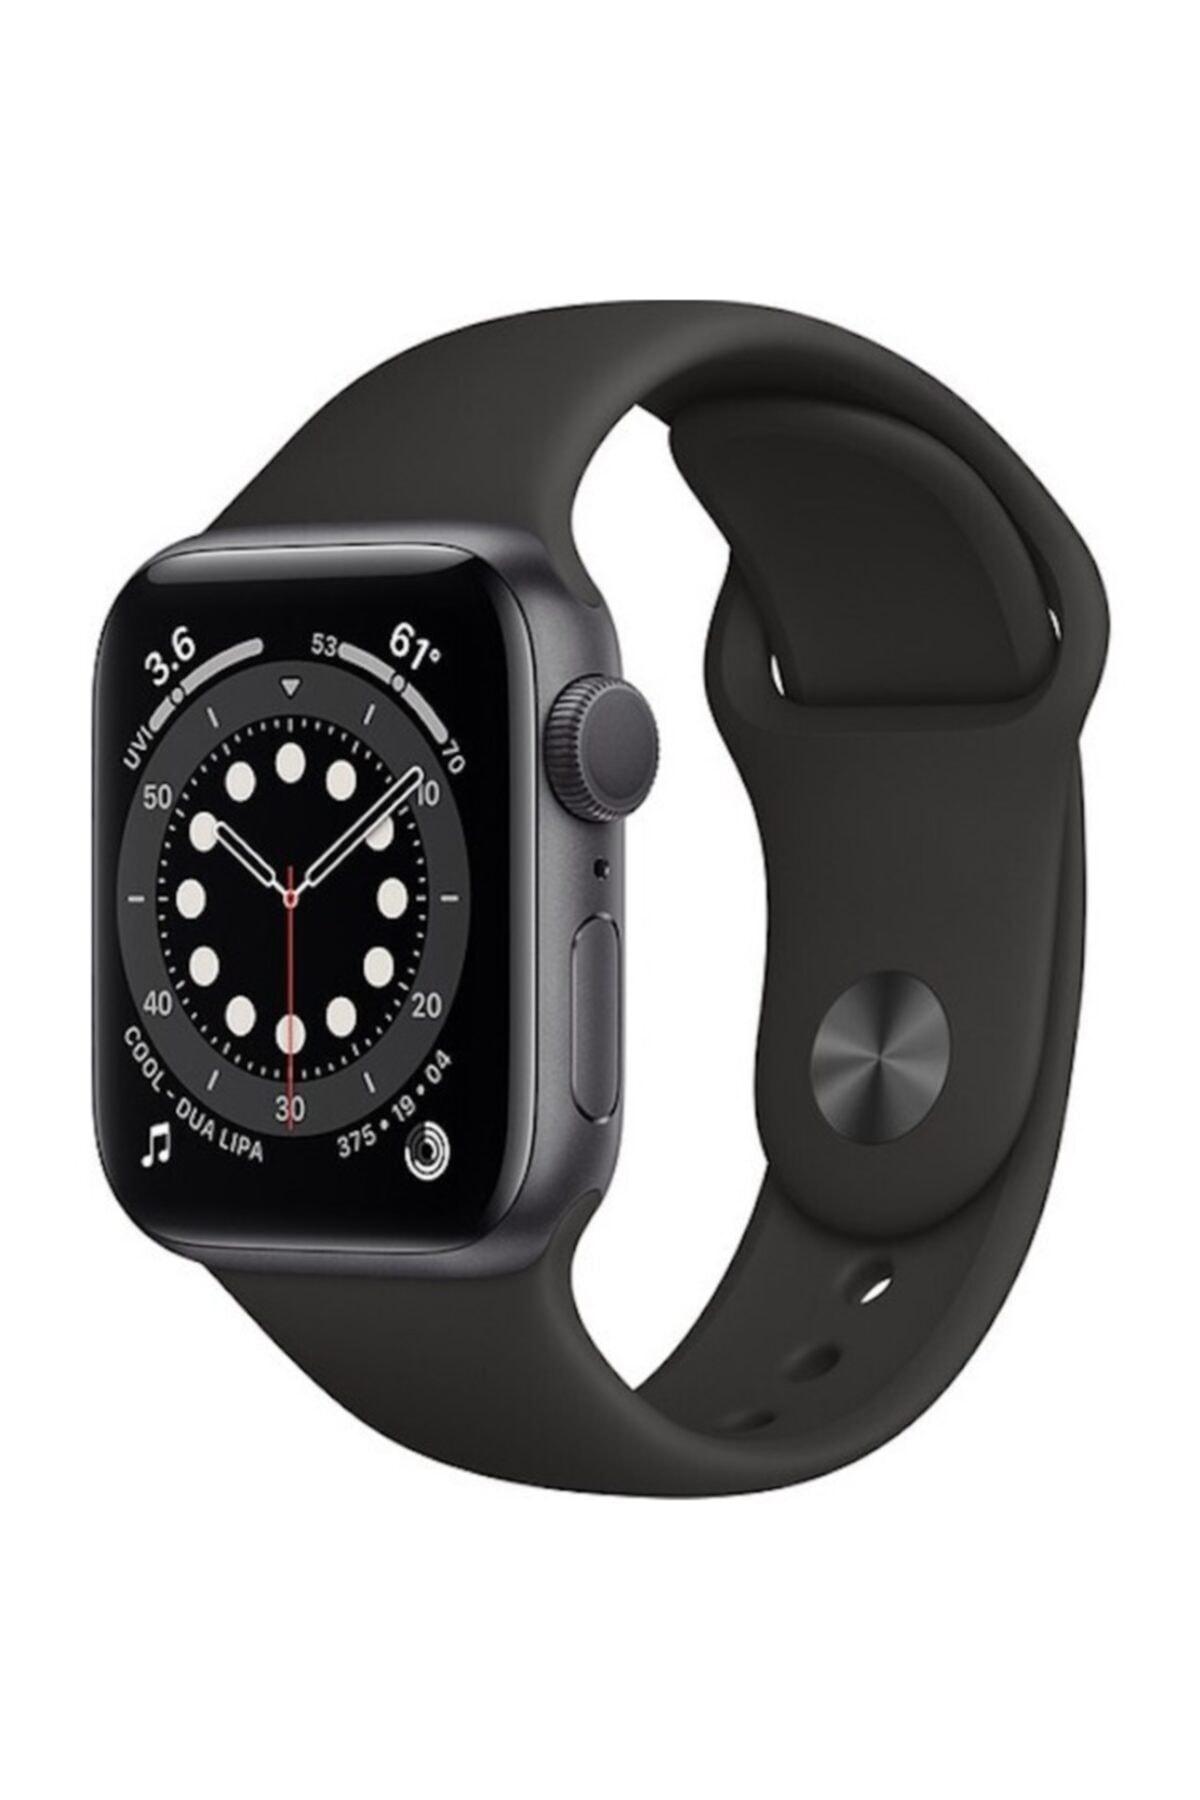 Apple Watch Series 6 Gps 44 Mm Uzay Grisi Alüminyum Kasa Ve Siyah Spor Kordon 1